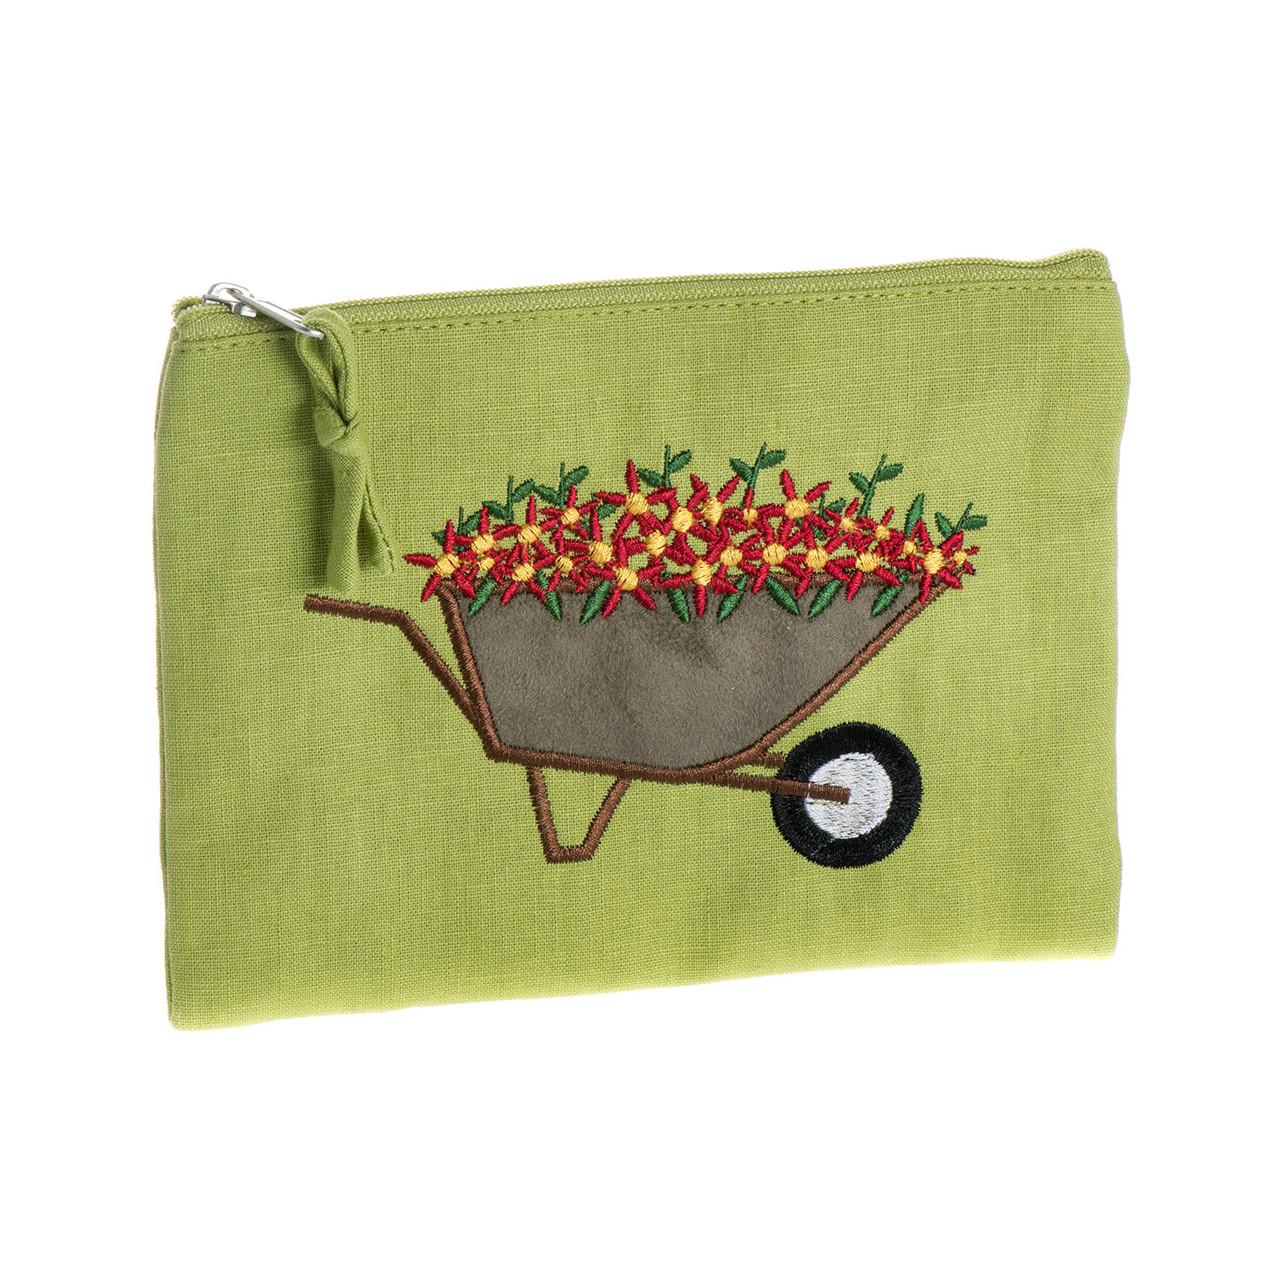 Wheelbarrow Purse